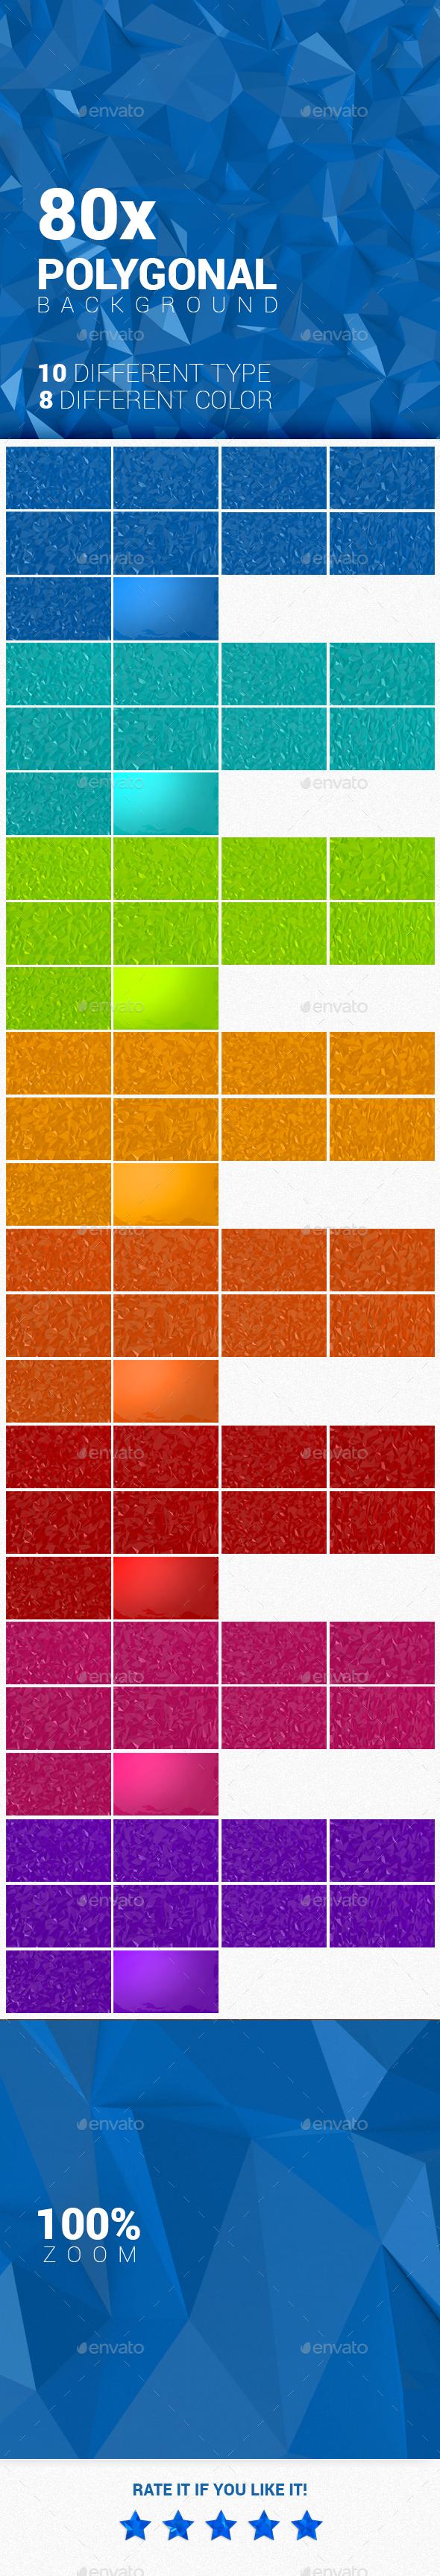 5k Polygonal backgrounds - Backgrounds Graphics